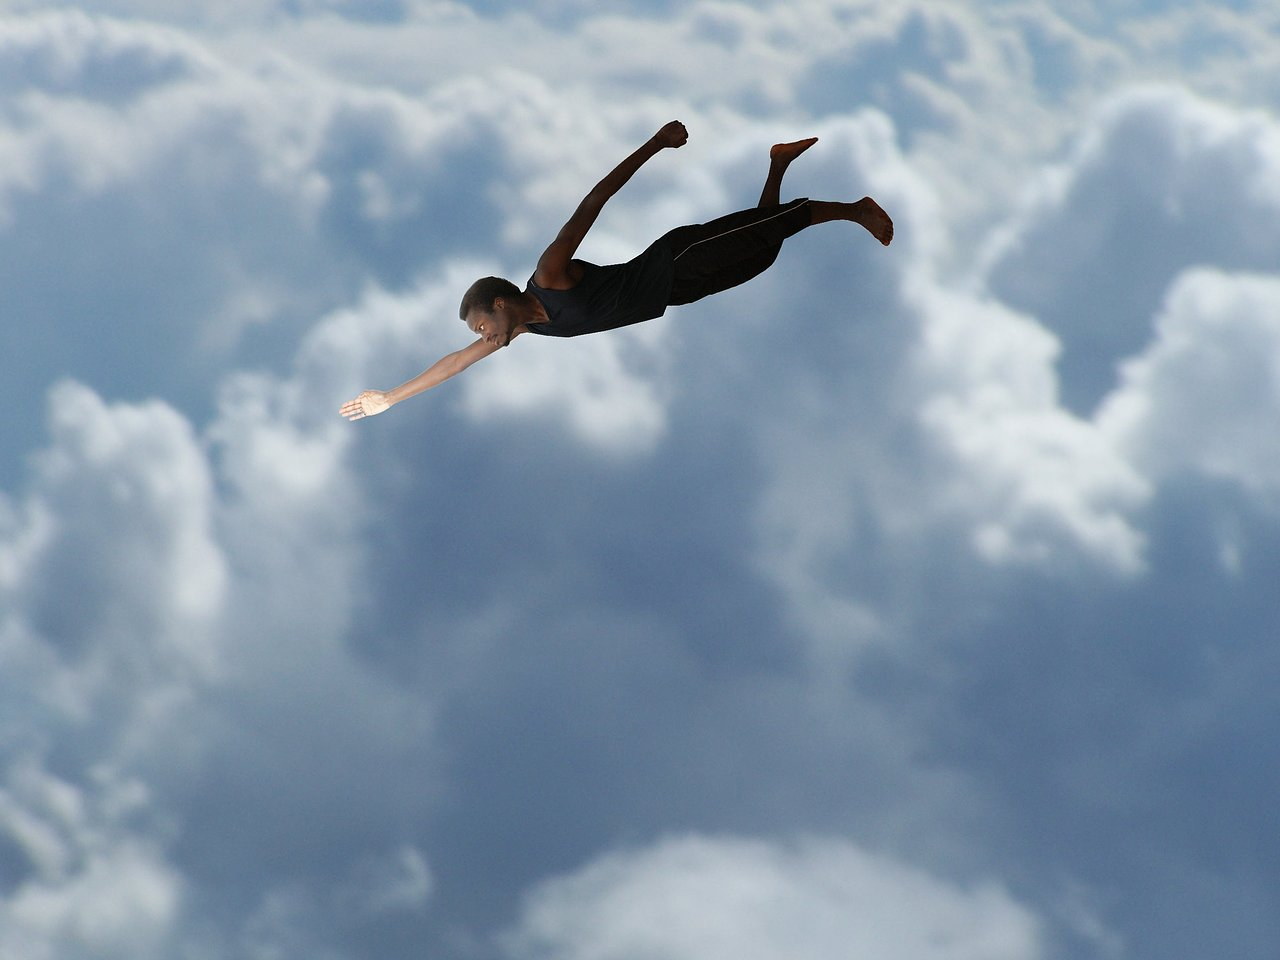 Emmanuel Buriez Fly